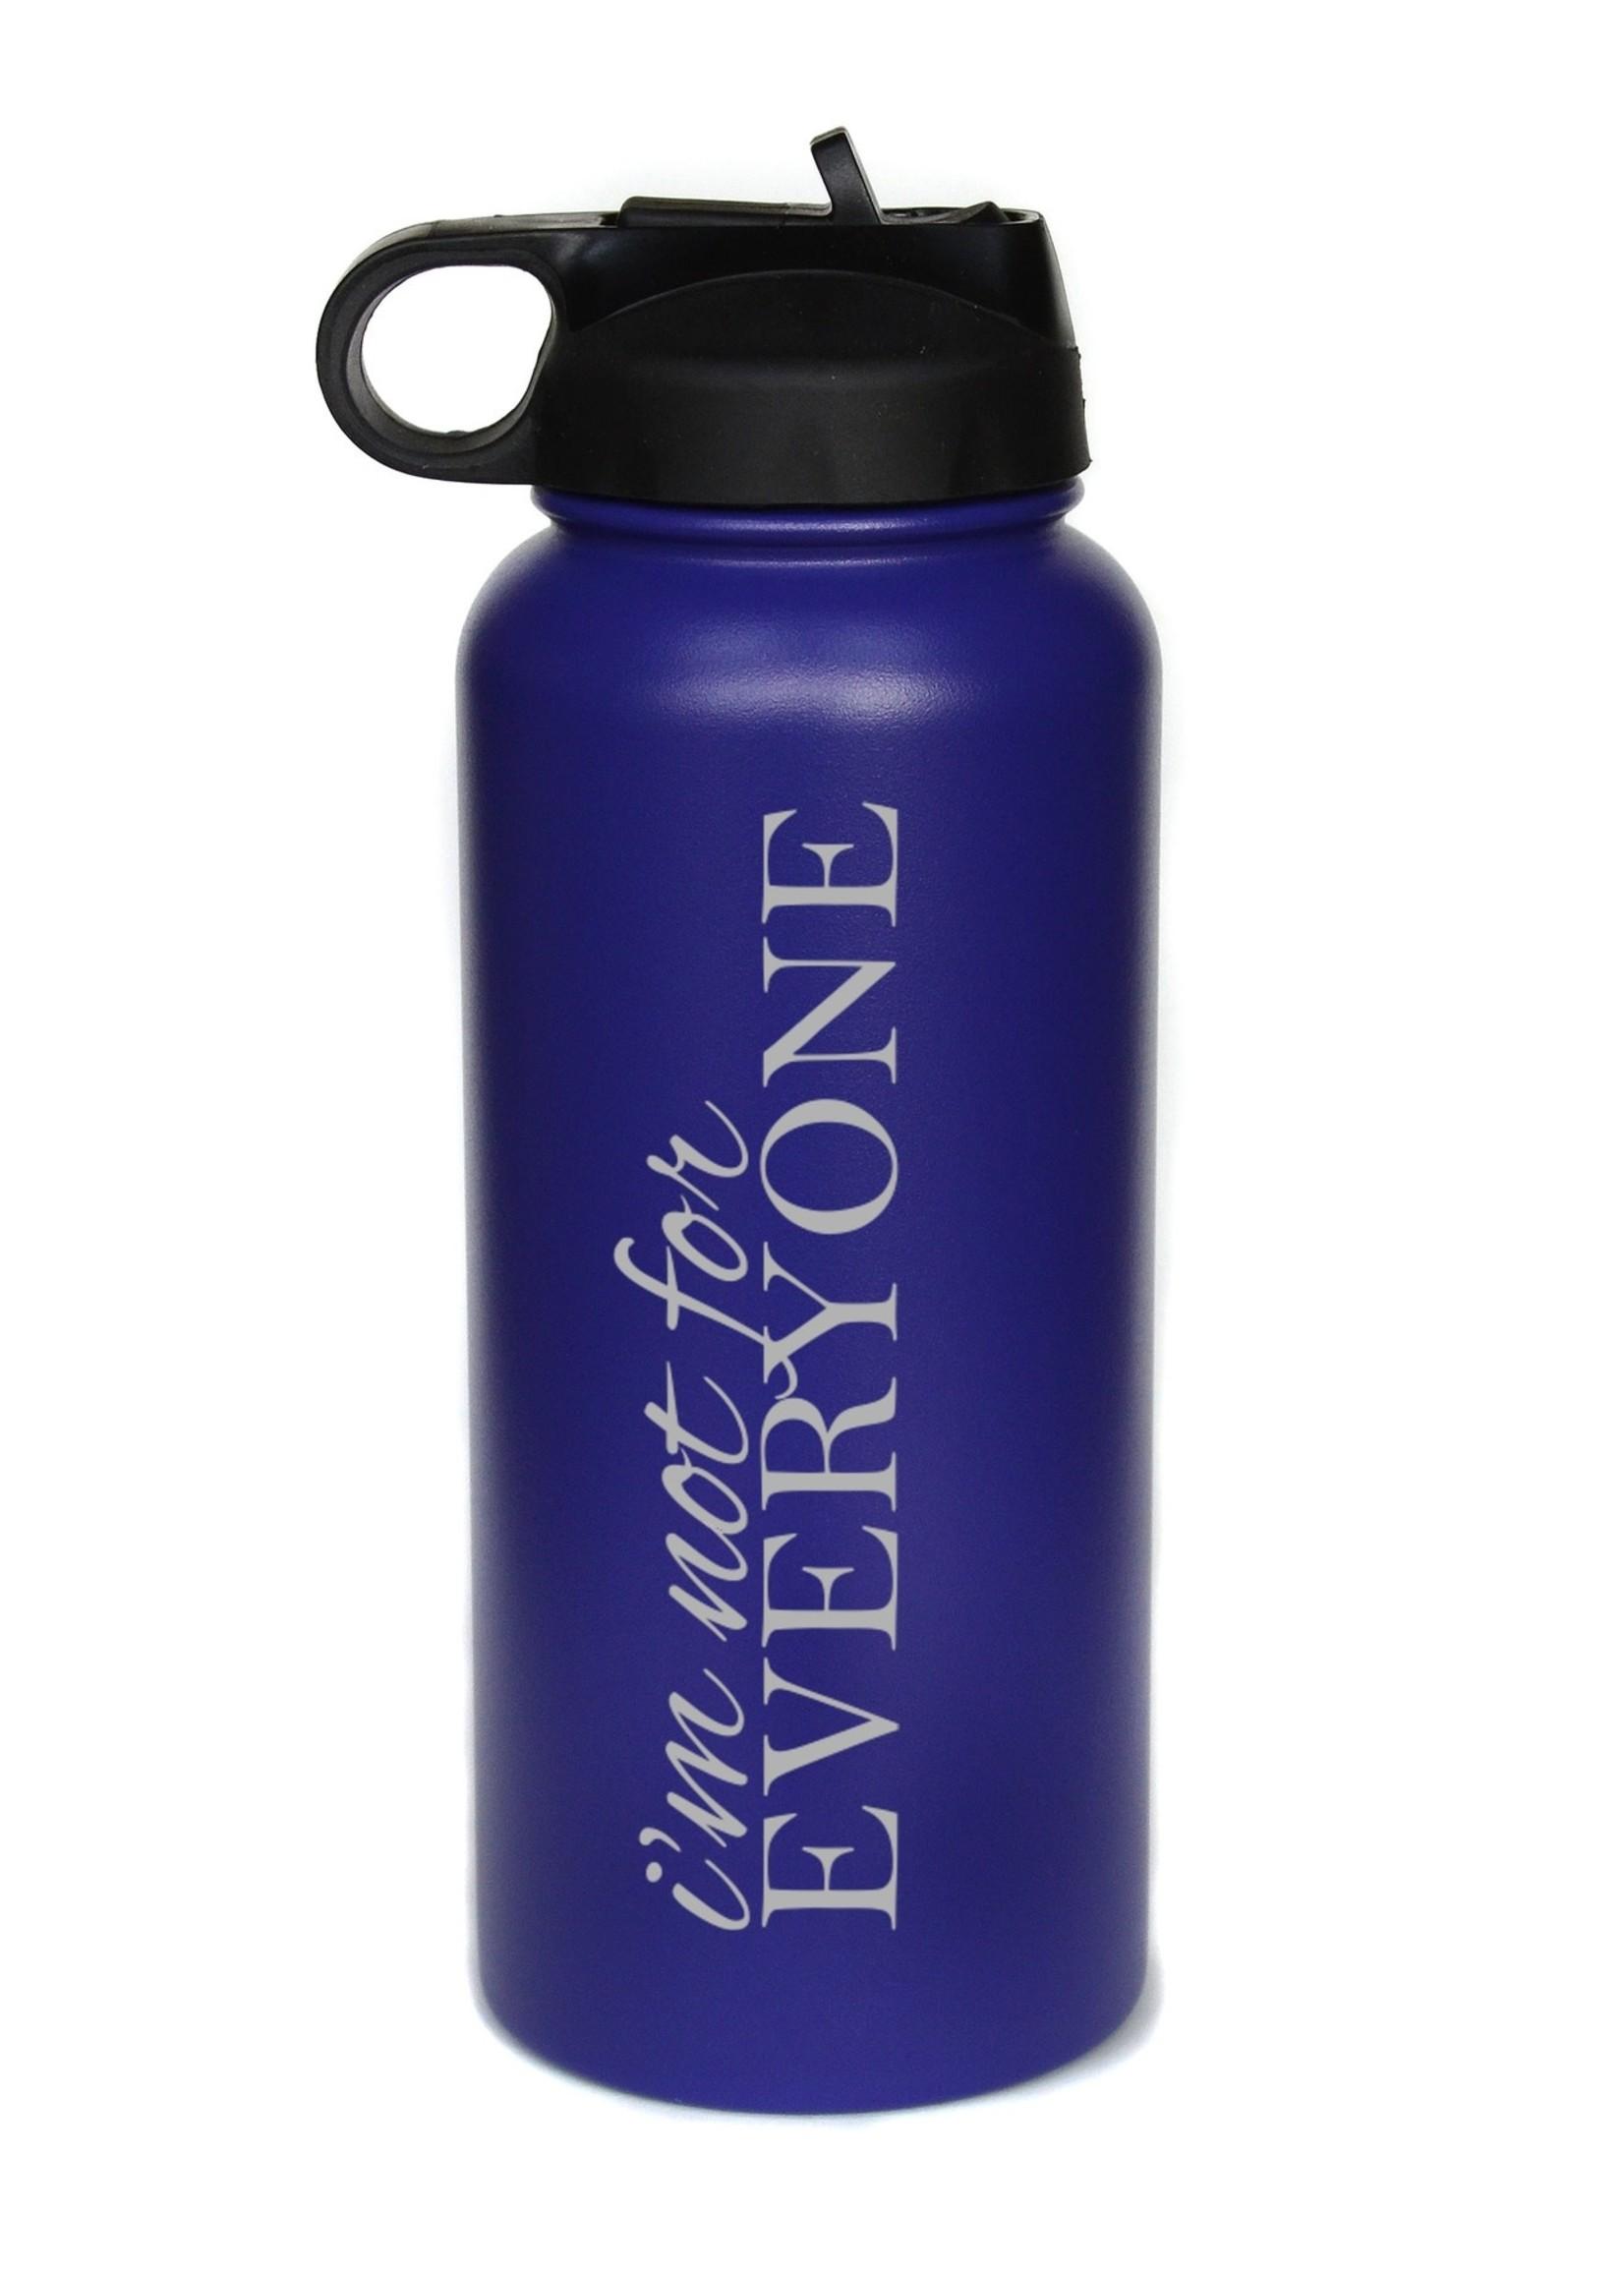 32 oz Water Bottle - Not Everyone - Black